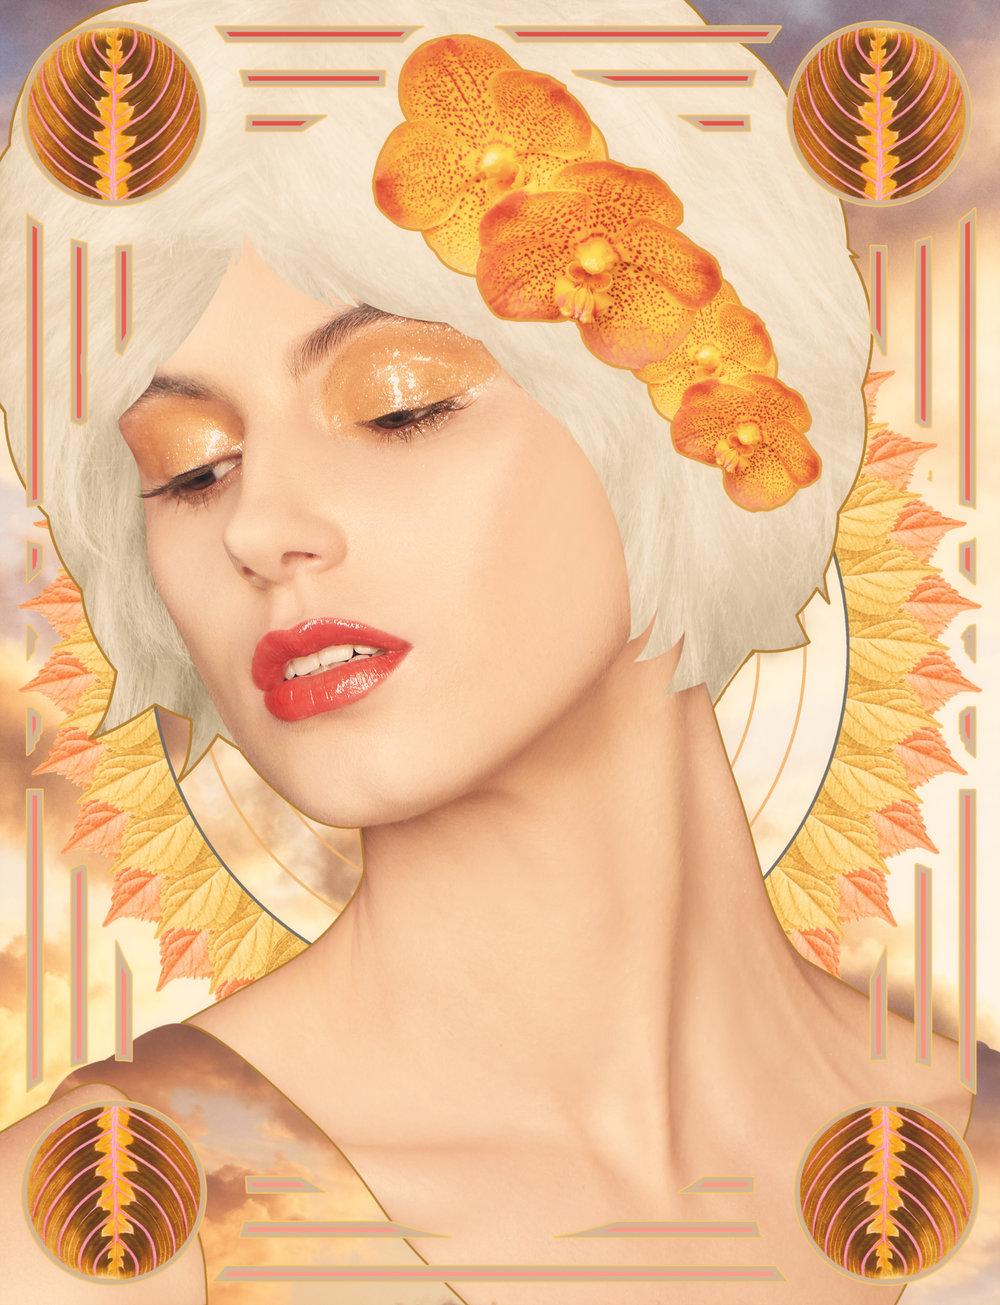 Dolce&Gabbana / George McLeod / Luxure Magazine